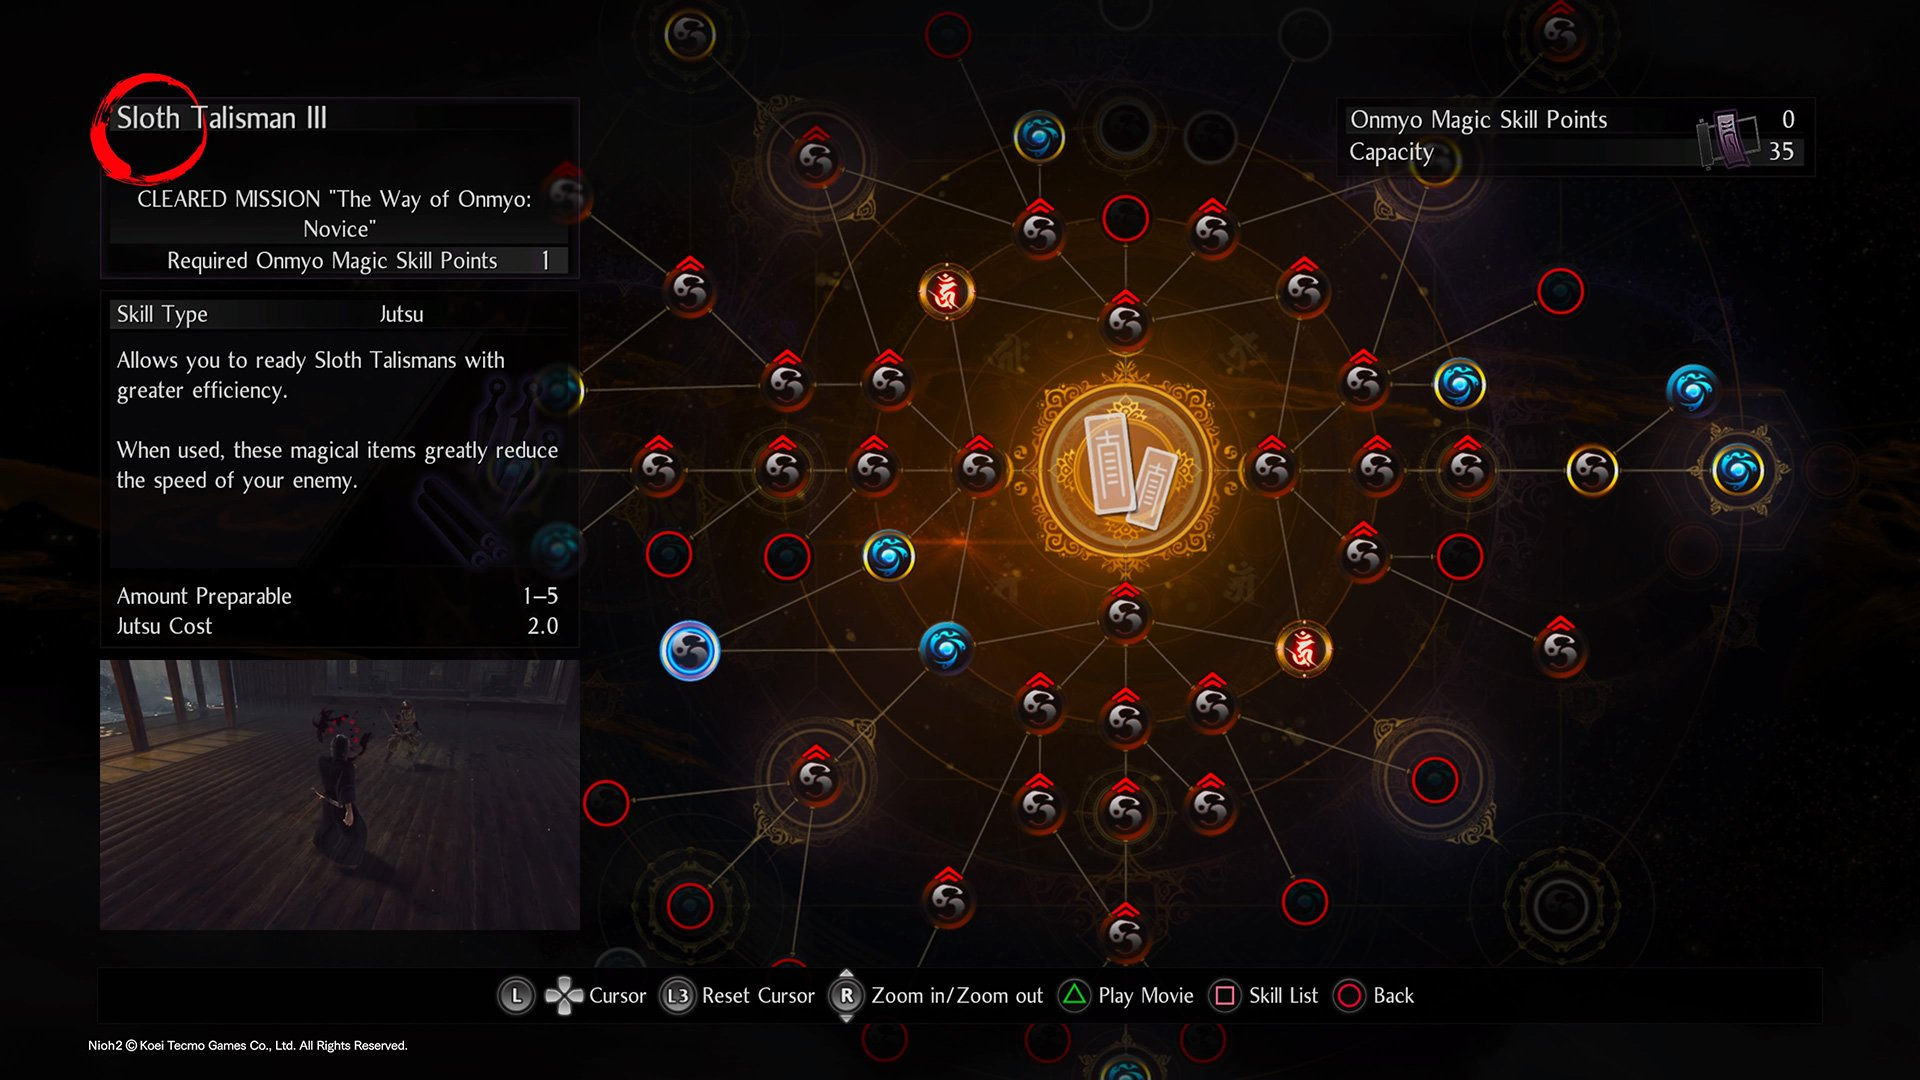 Where to find Sloth Talisman on the Nioh 2 Onmyo Magic skill tree